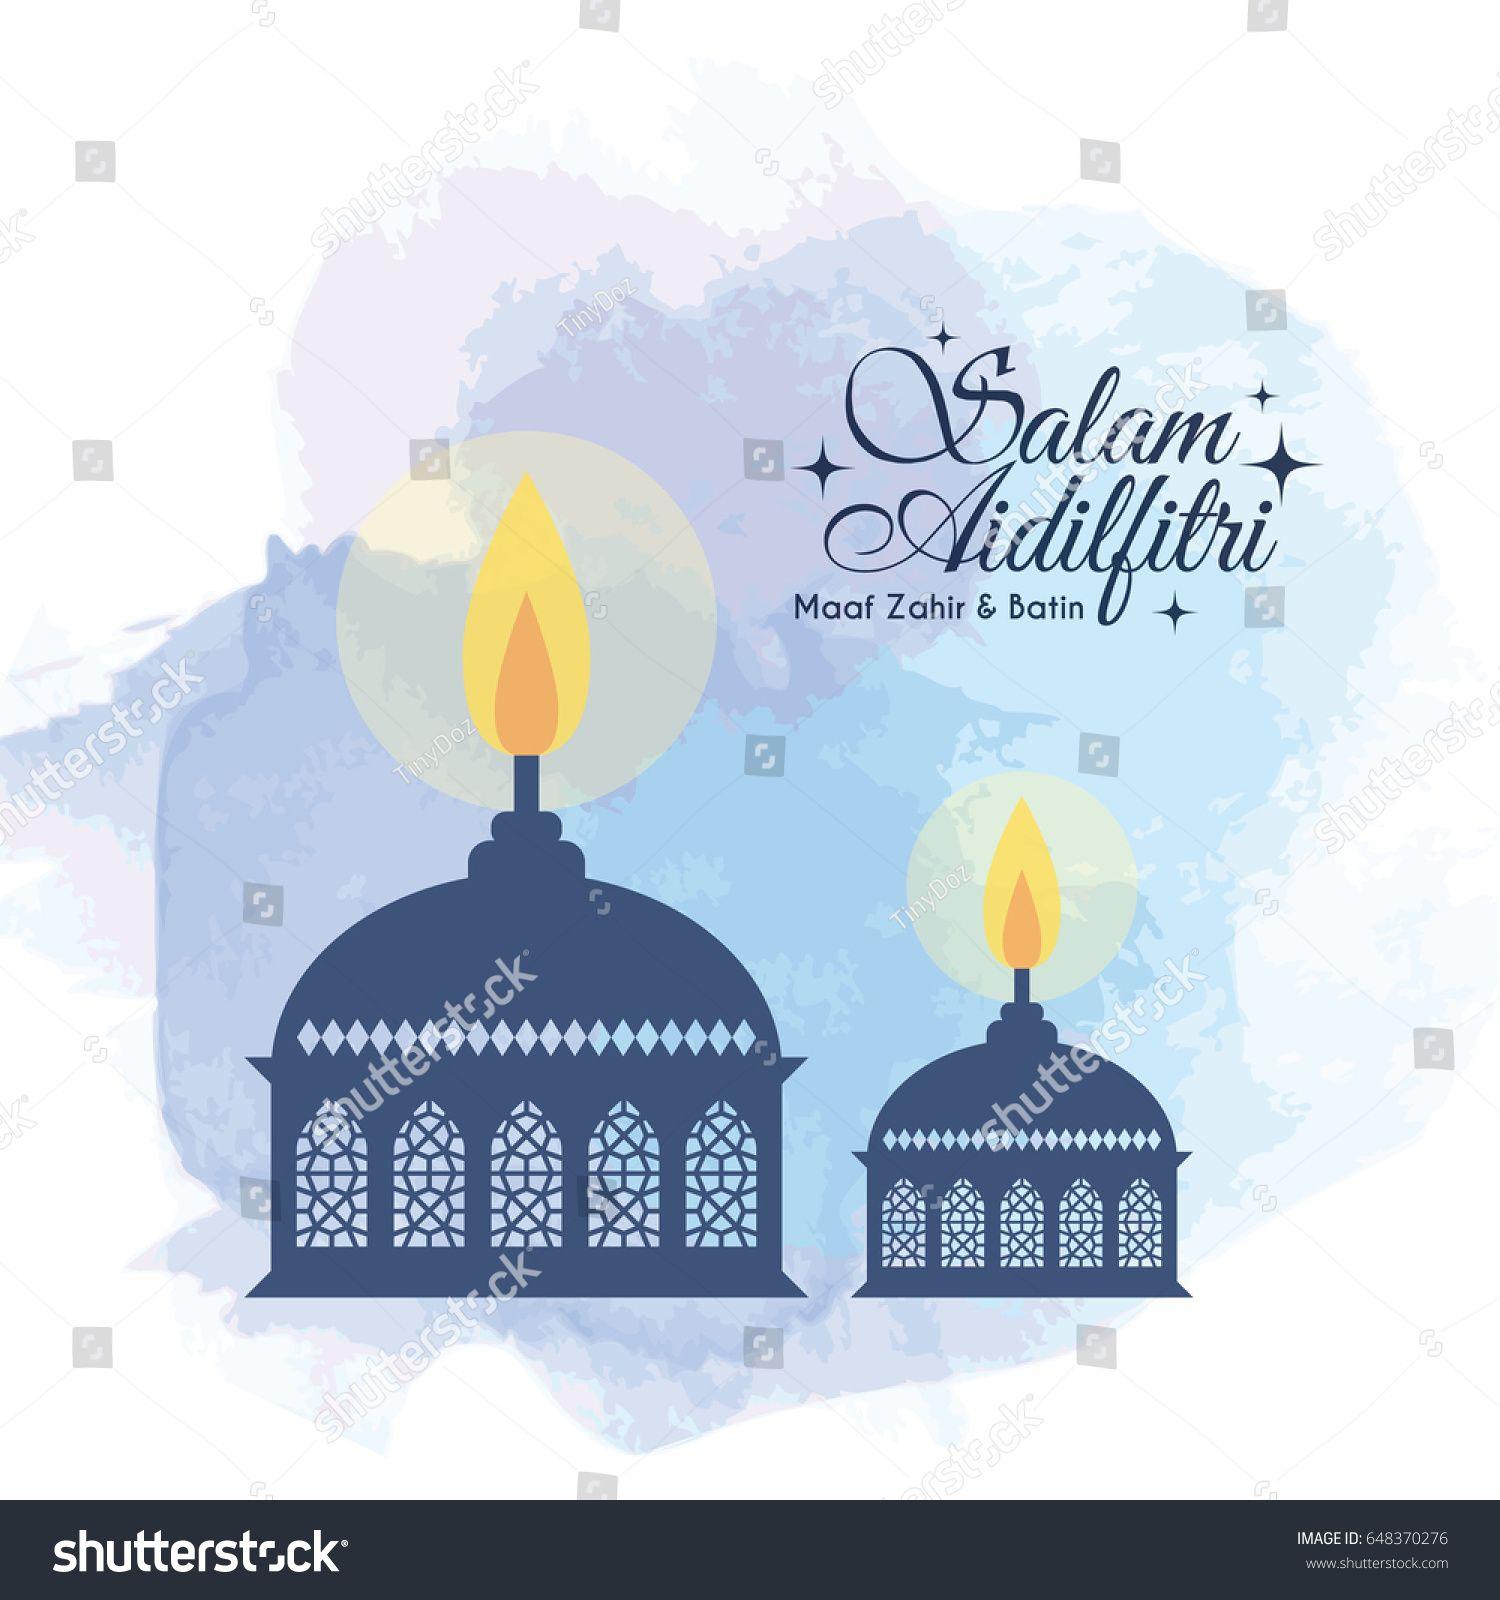 Hari Raya Aidilfitri Greeting Card Template Stock Vector Design Muslim Oil Lamp Pelita Blue